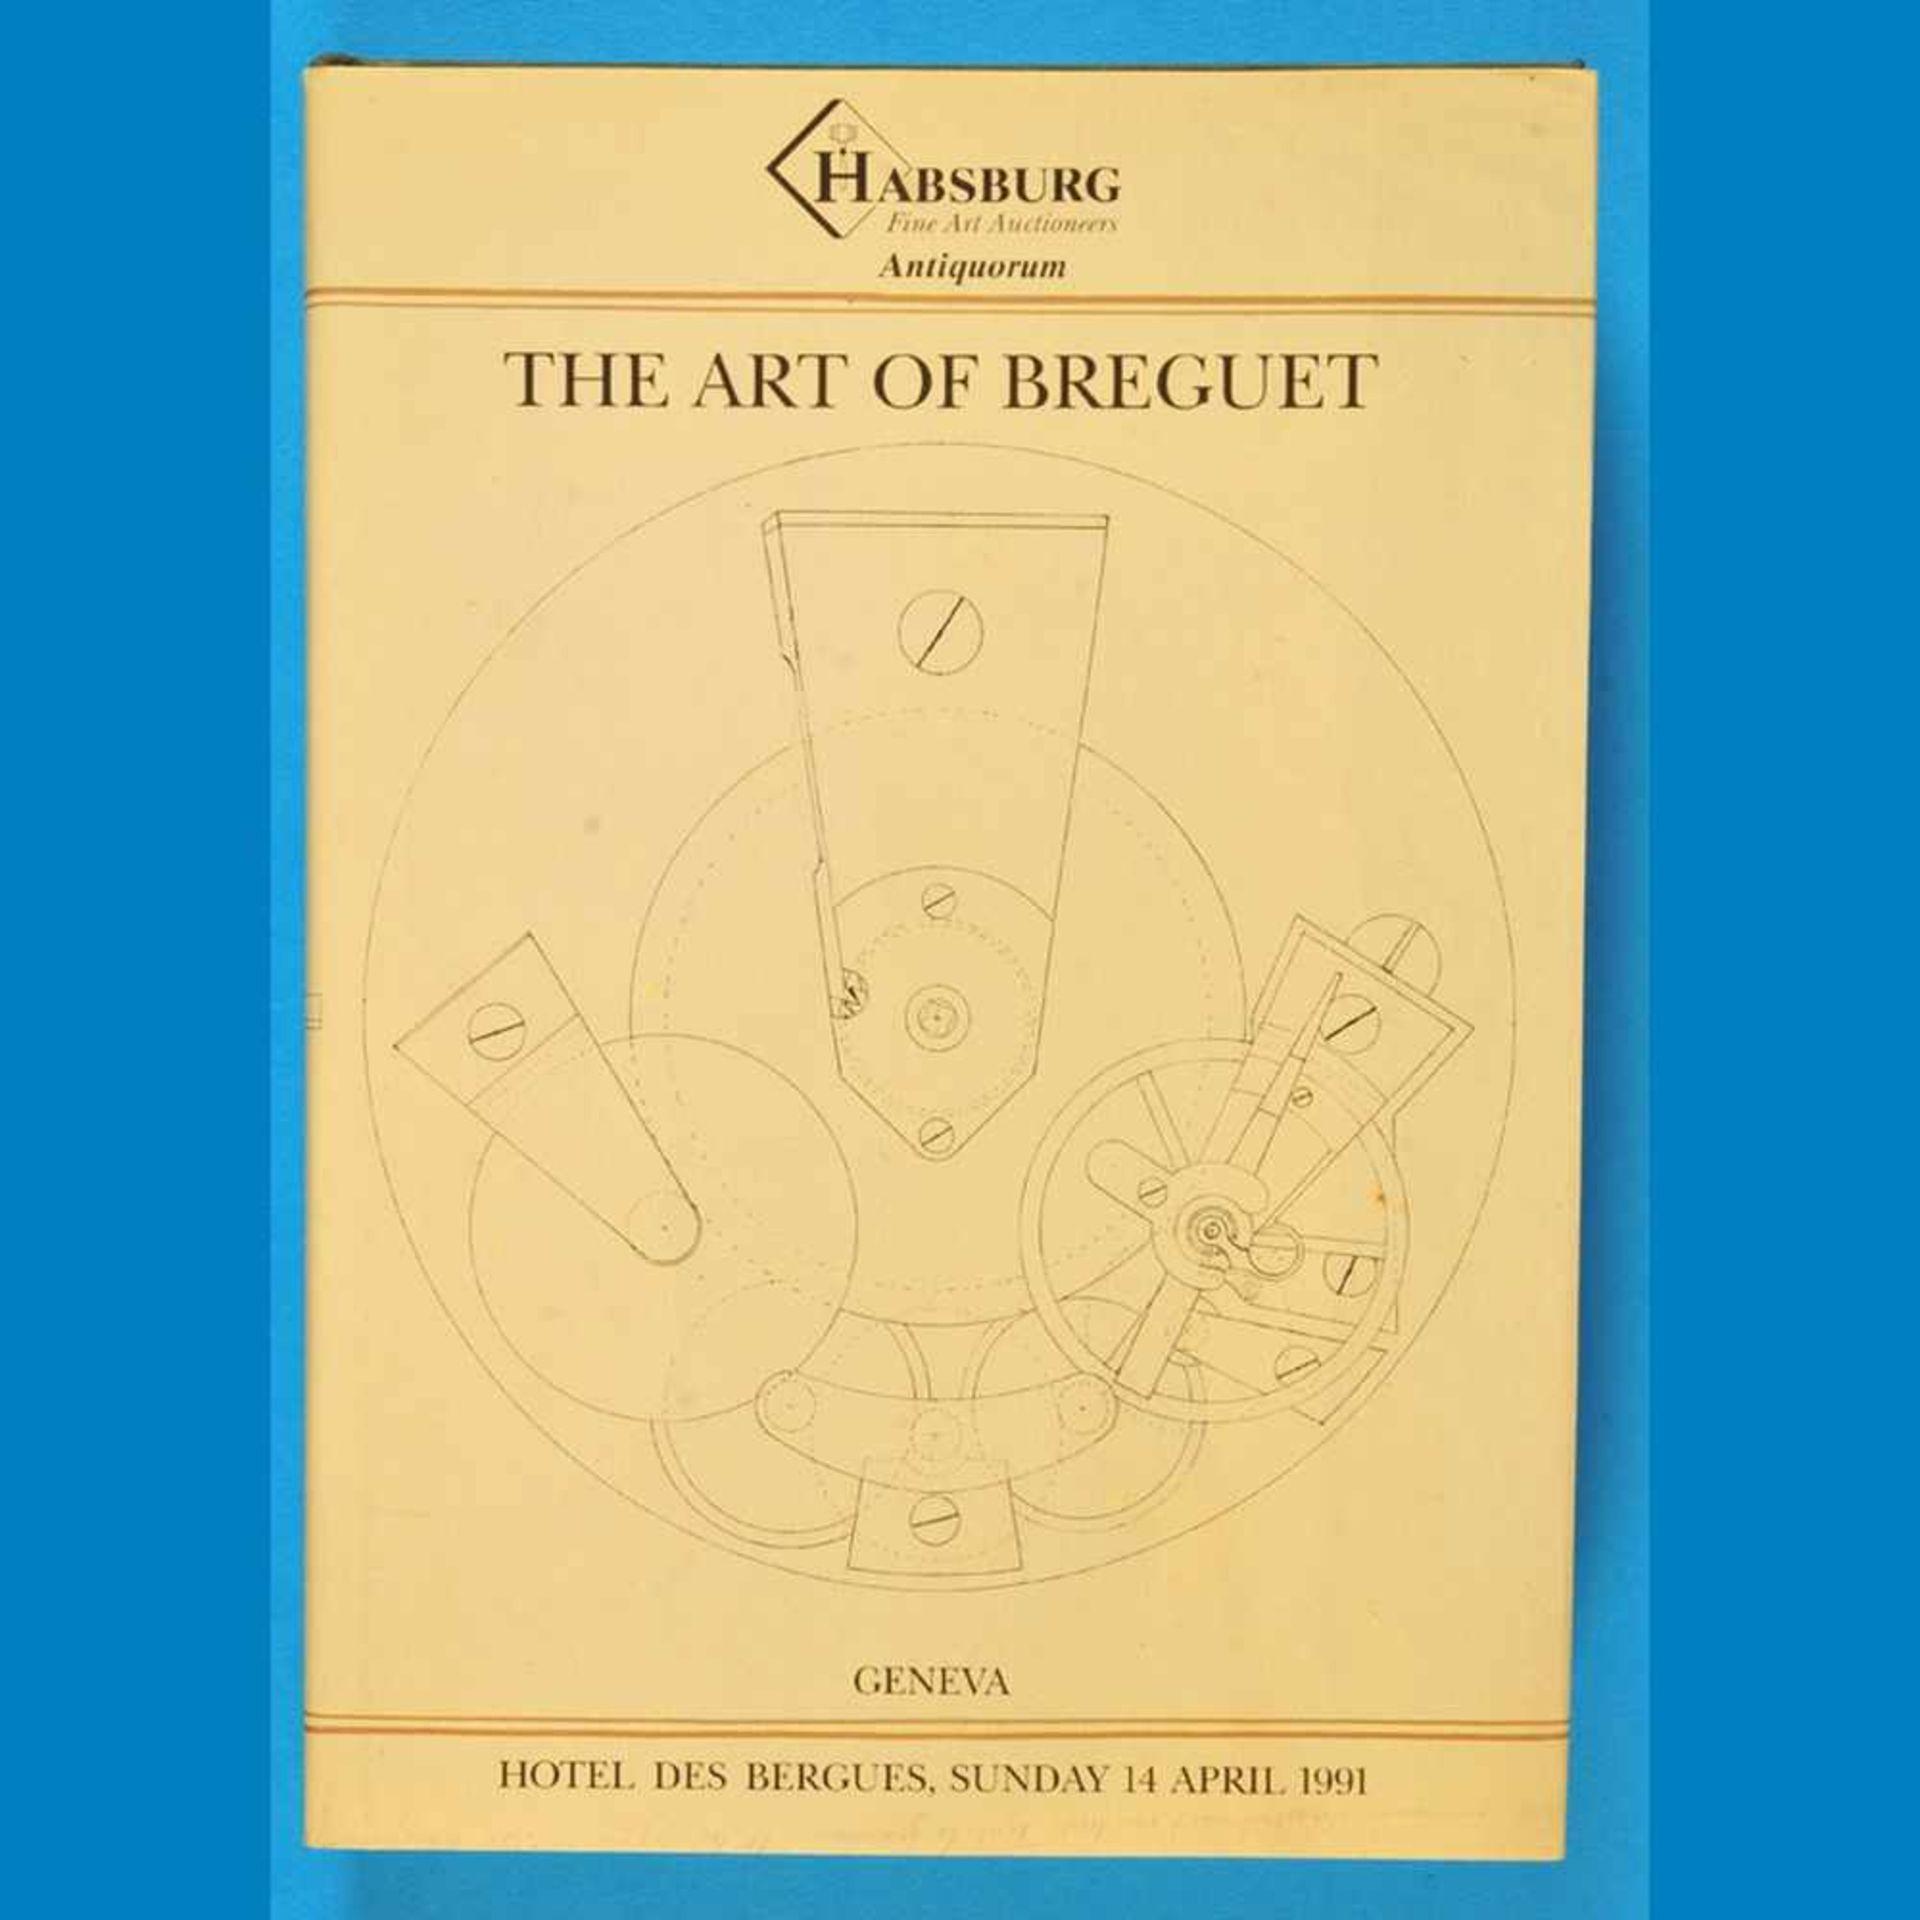 Antiquorum, The Art of Breguet, Katalog von 1991Antiquorum, The Art of Breguet, Katalog von